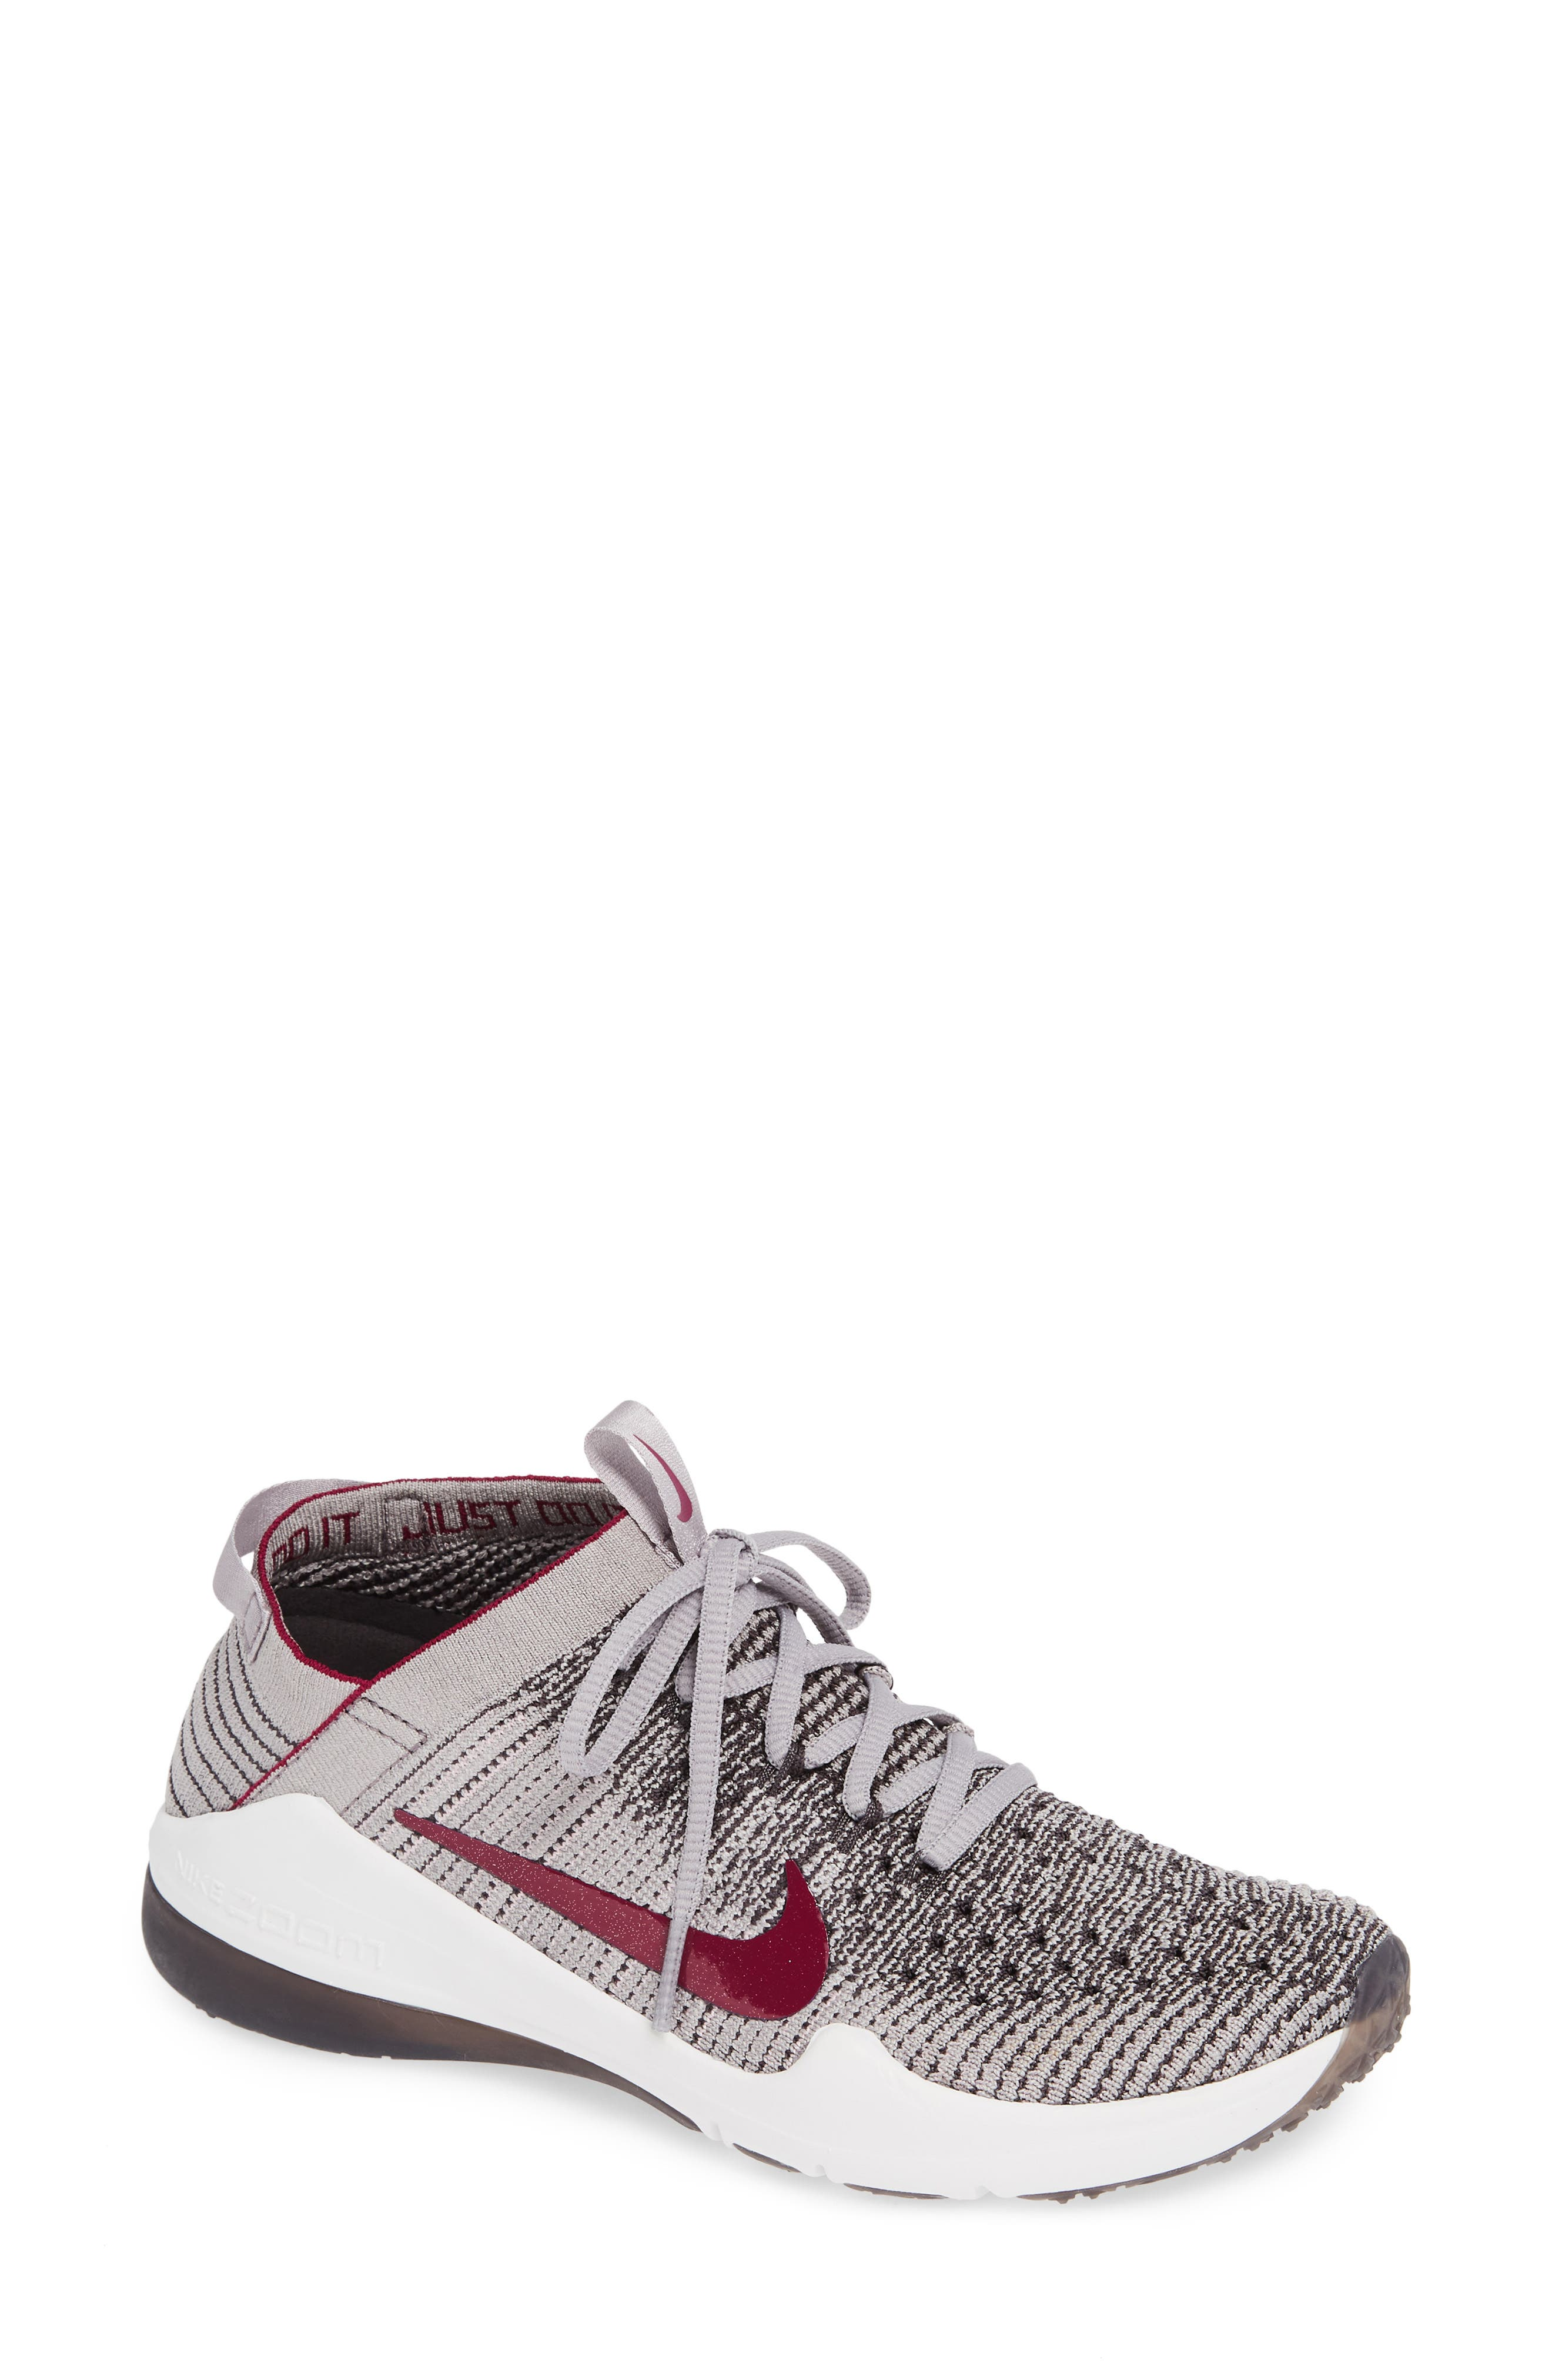 NIKE, Air Zoom Fearless Flyknit 2 Training Sneaker, Main thumbnail 1, color, GREY/ TRUE BERRY/ PLUM CHALK